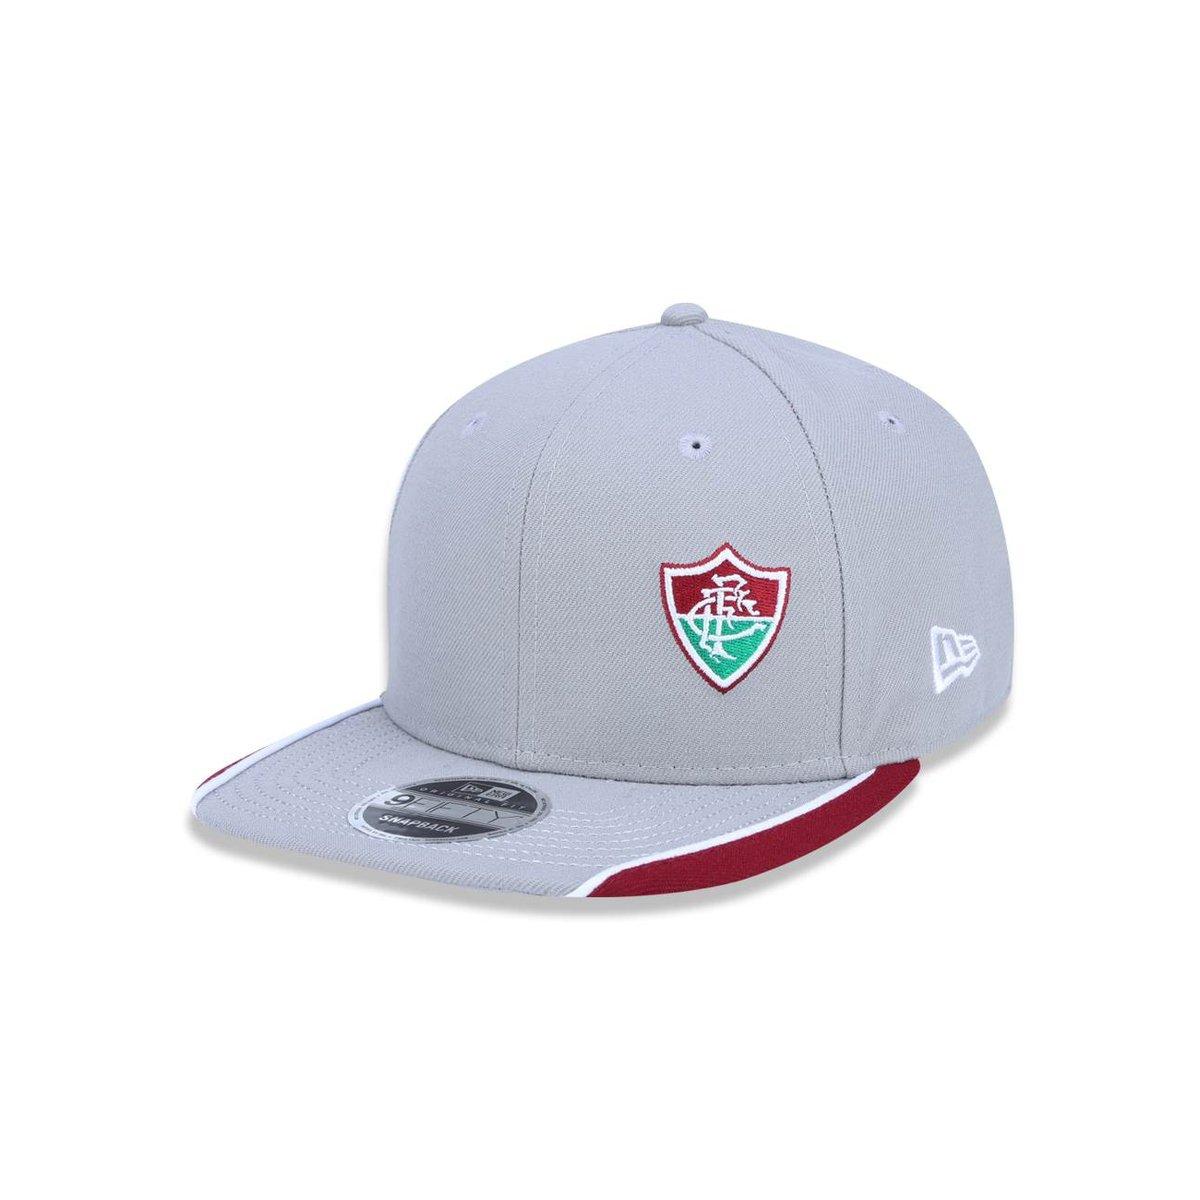 e94d6aa430328 Boné 950 Original Fit Fluminense Futebol Aba Reta Snapback New Era - Compre  Agora